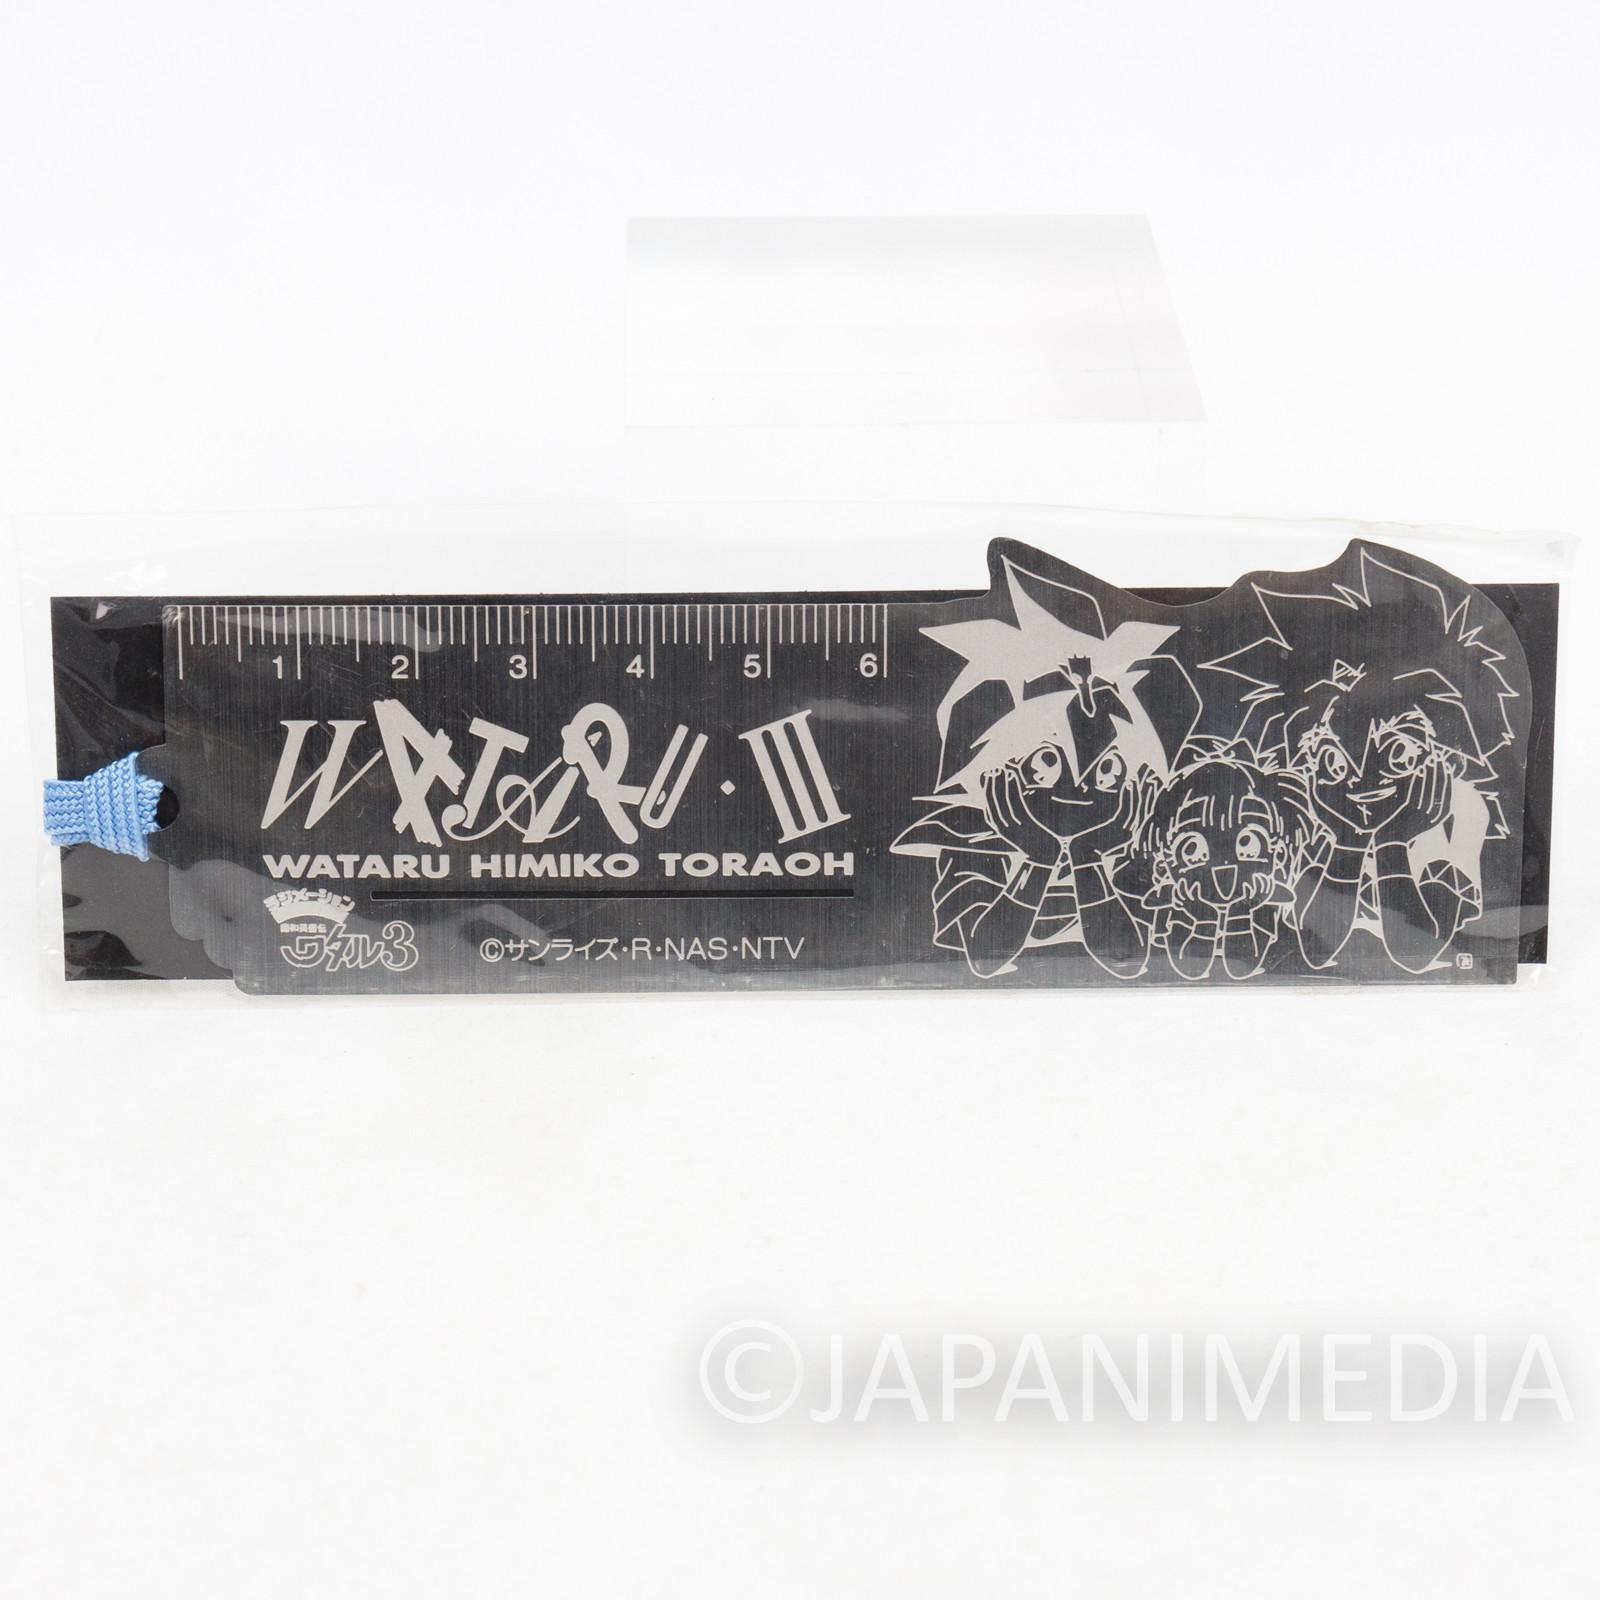 Mashin Eiyuden Hero Wataru Himiko Toraoh Metal Bookmaker JAPAN ANIME MANGA